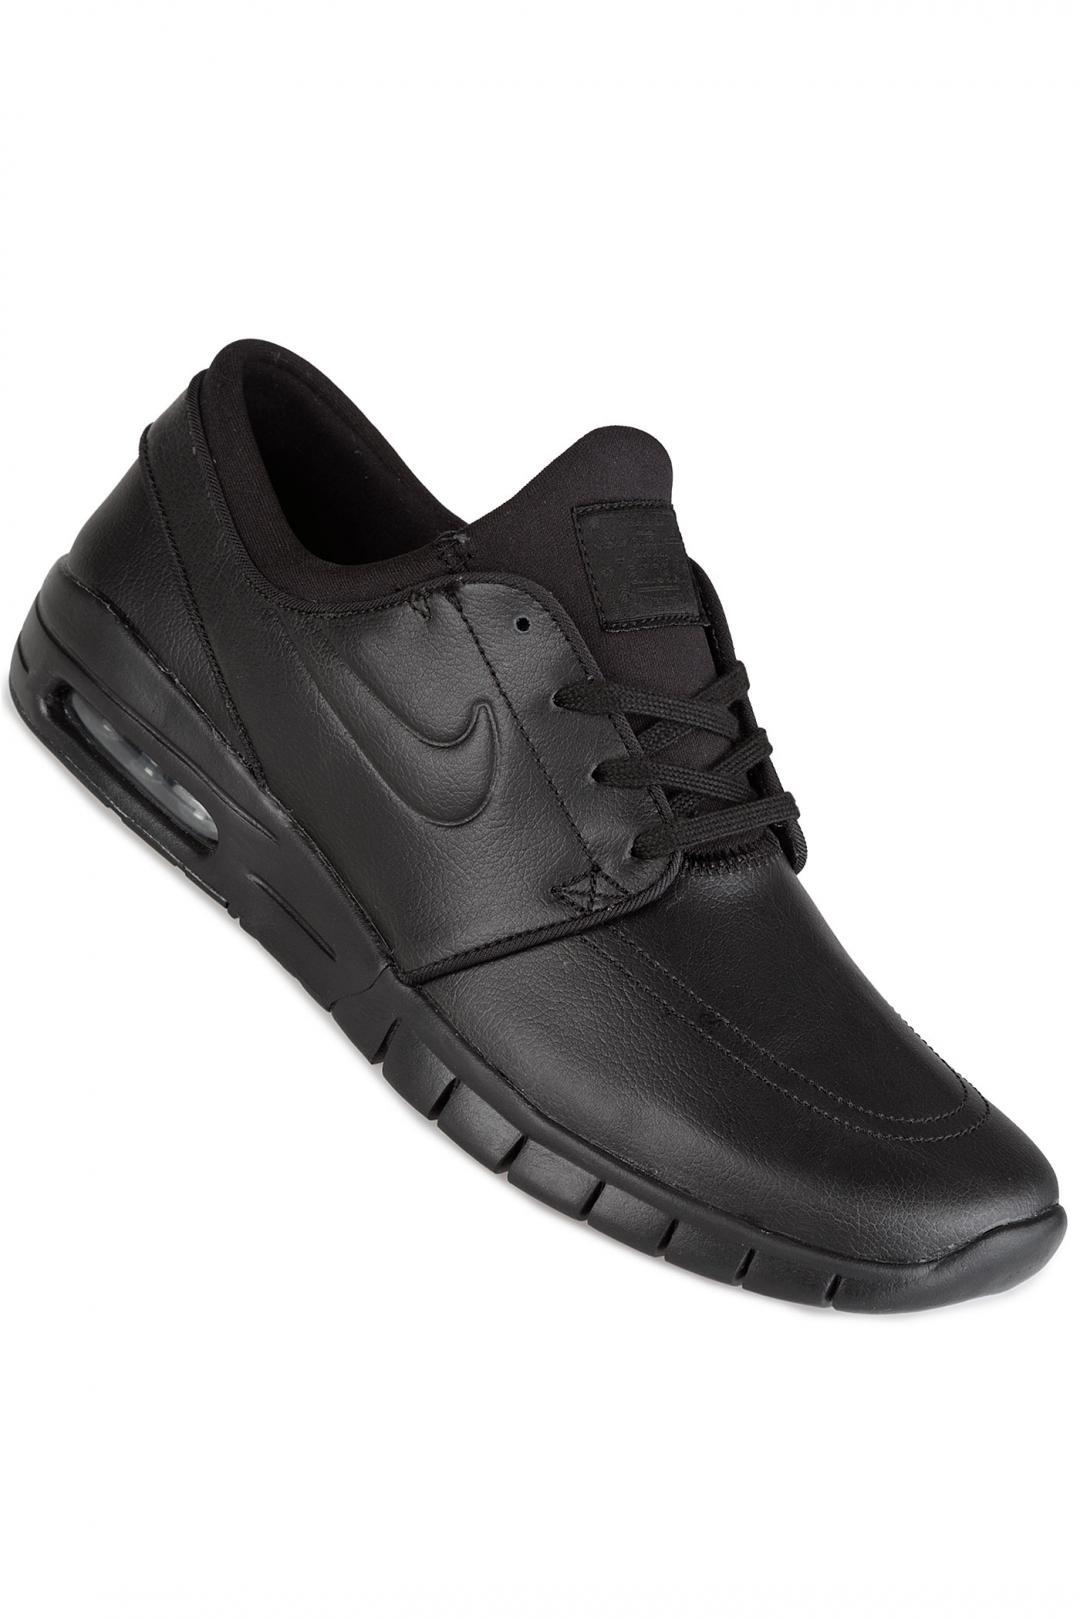 Uomo/Donna Nike SB Stefan Janoski Max L black black metallic pewter | Sneaker